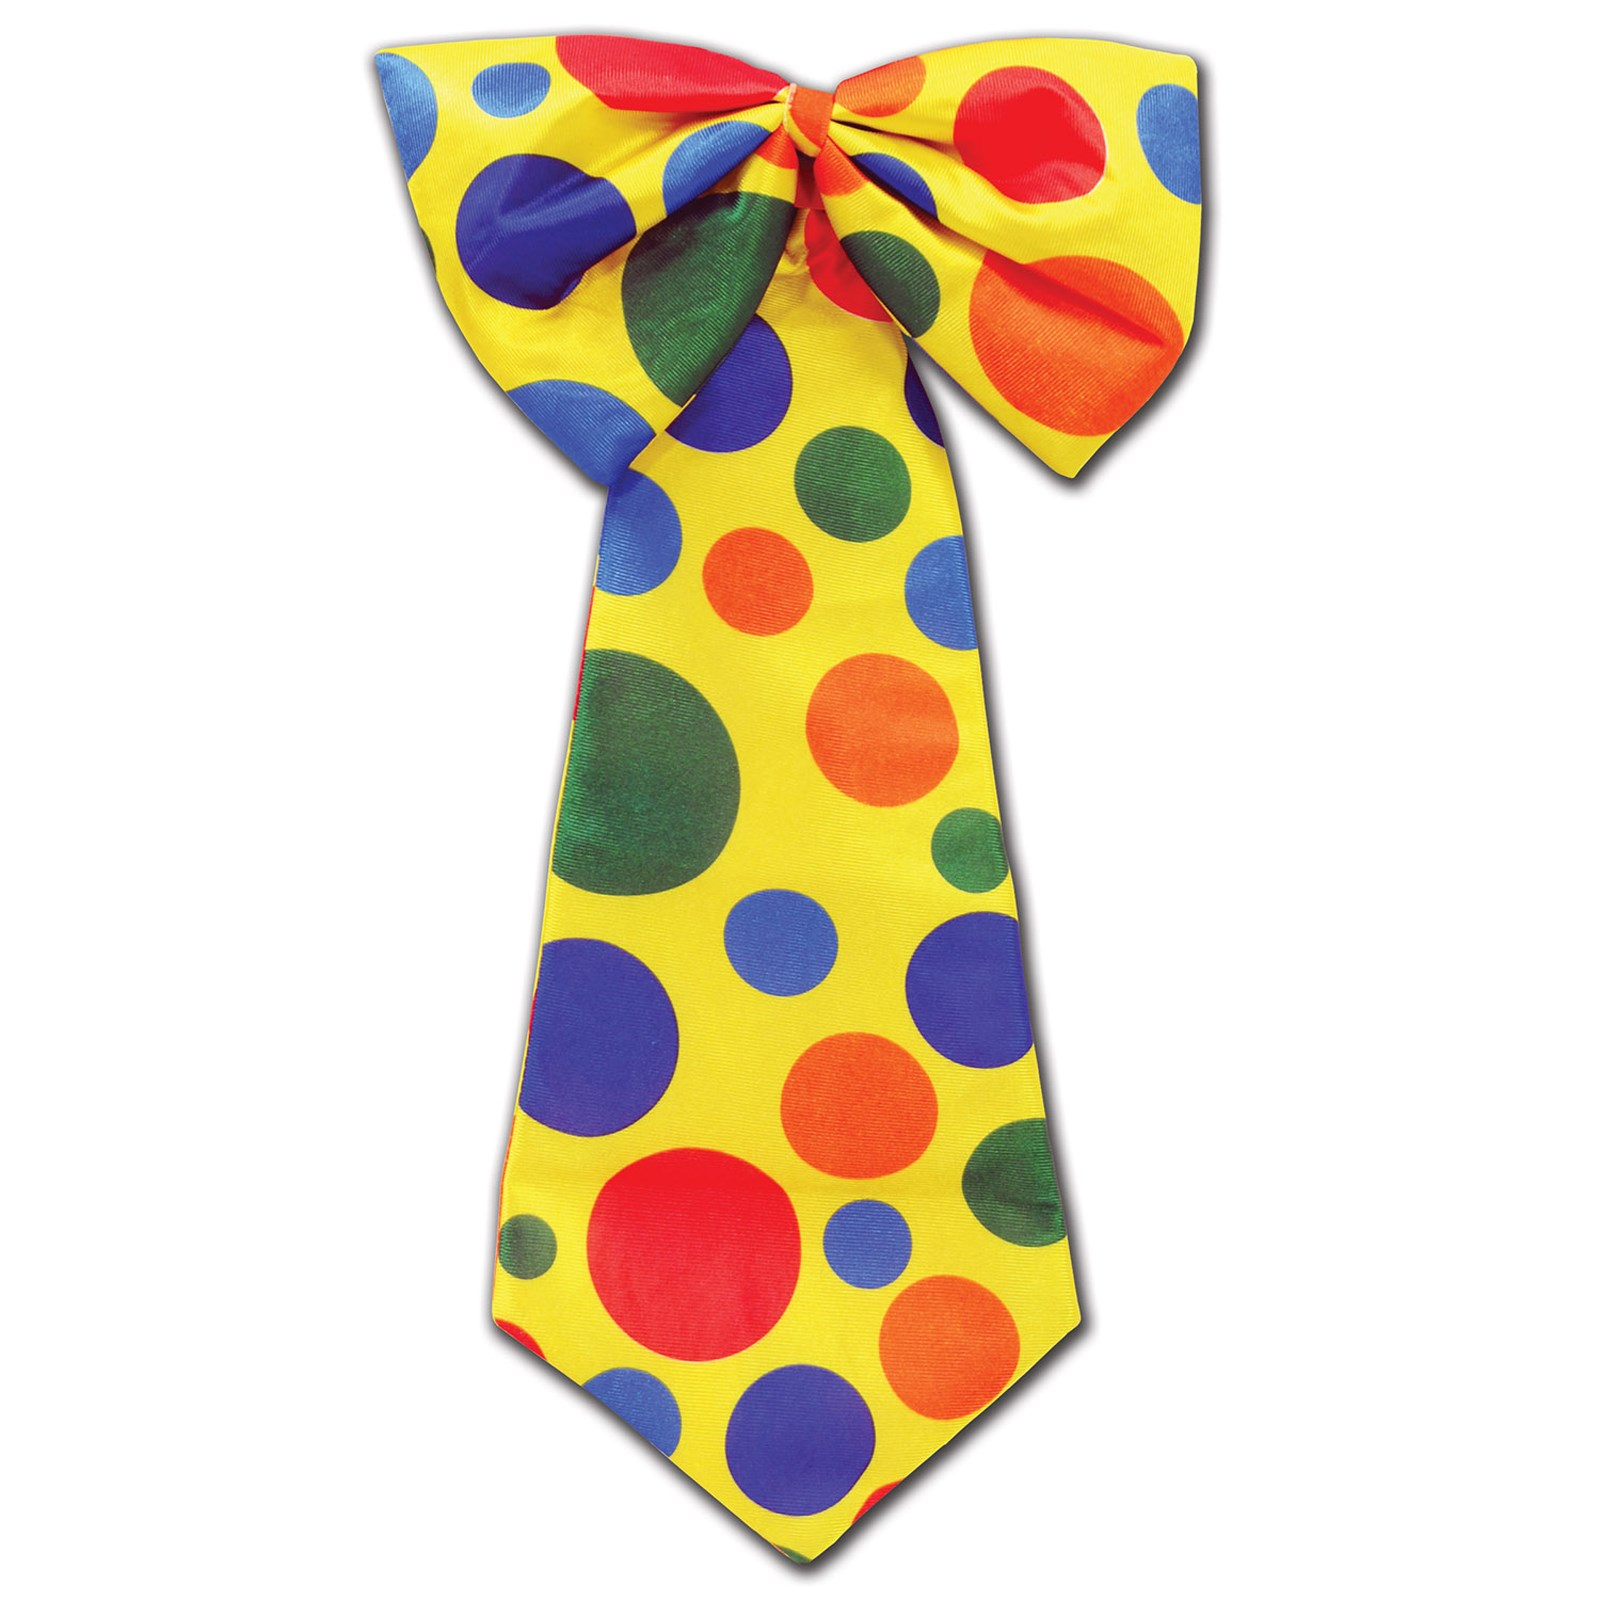 clown bow tie photo - 1